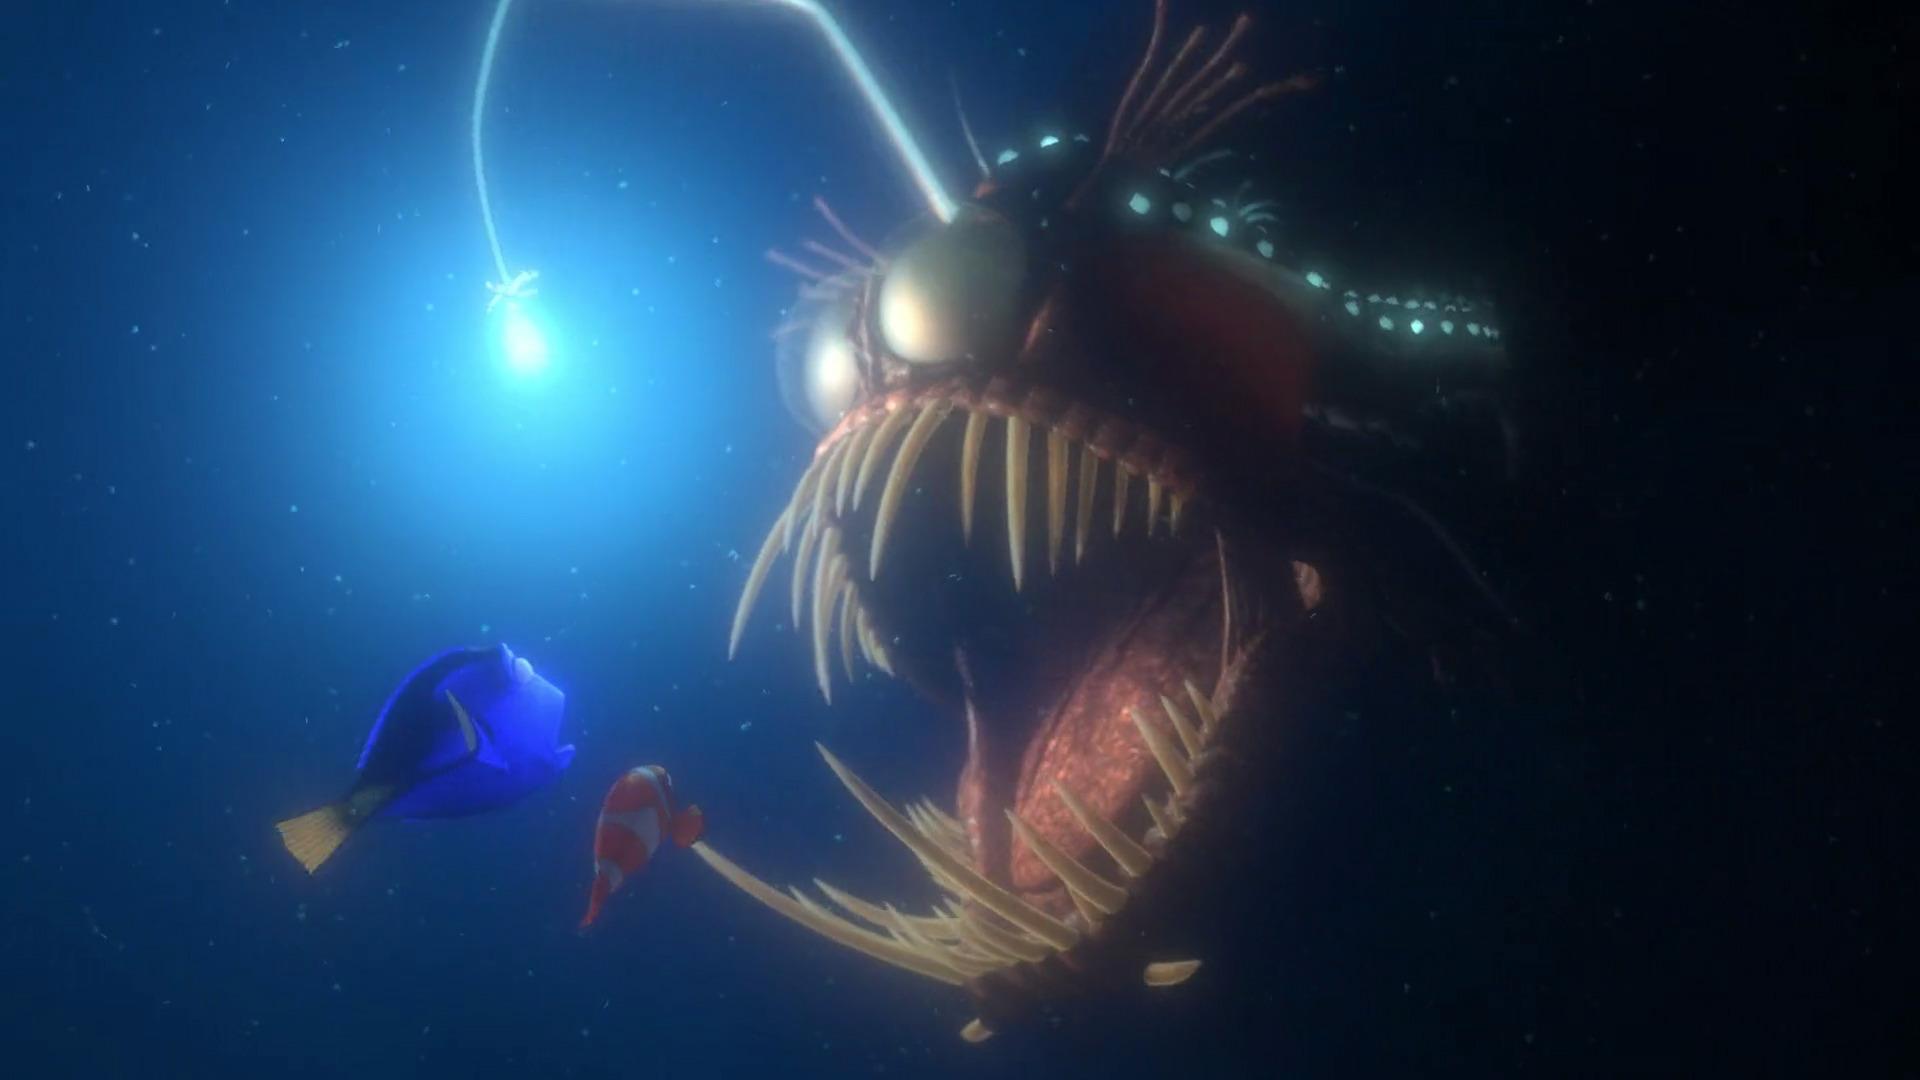 Pixar rewind 39 finding nemo 39 rotoscopers for Finding nemo angler fish